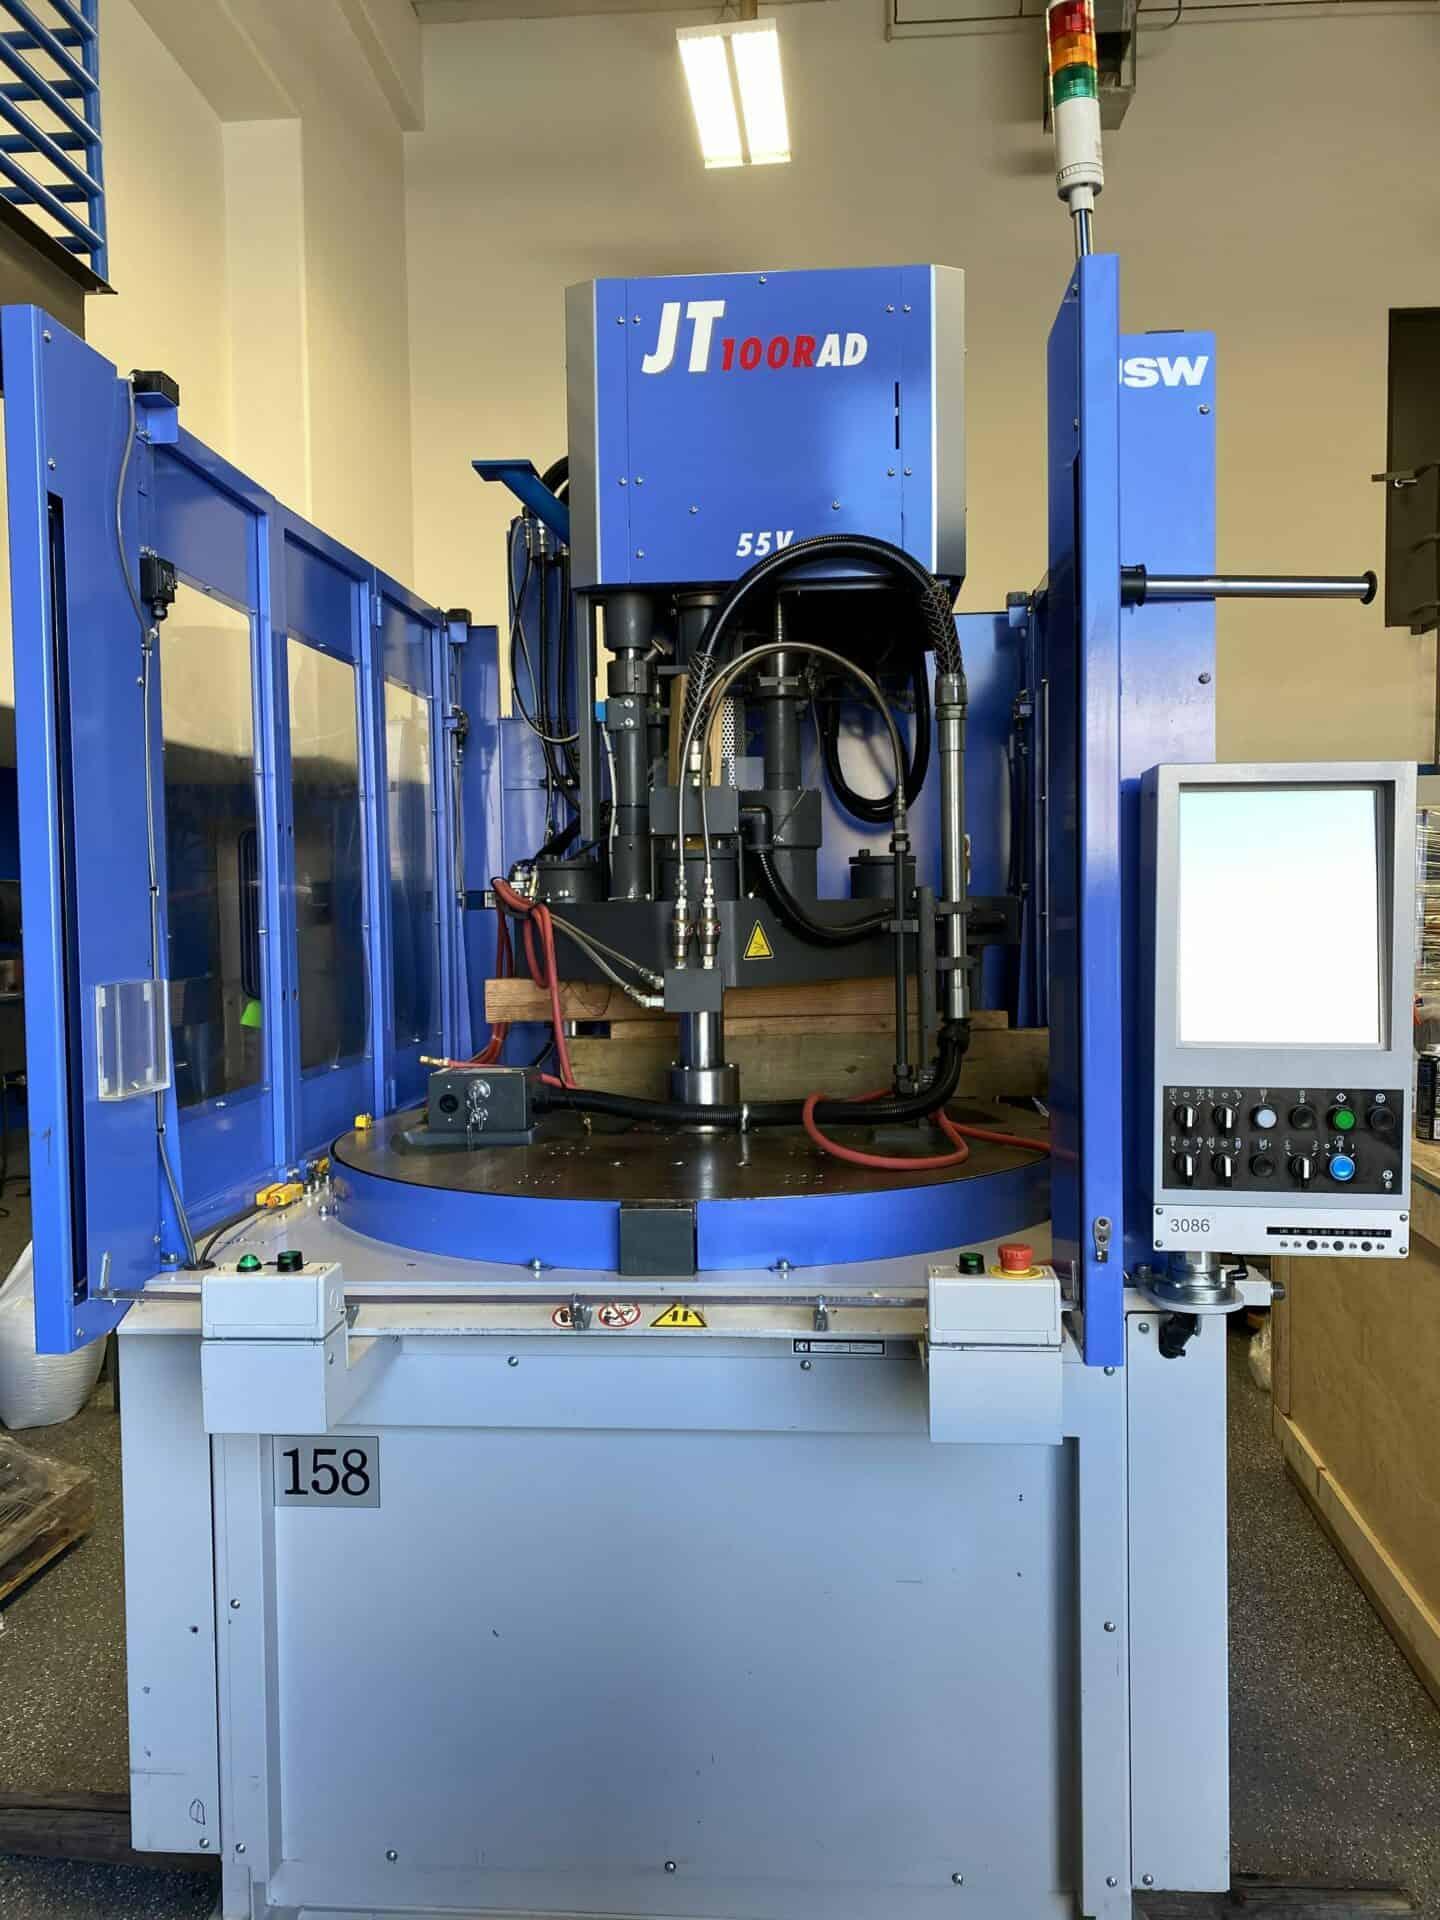 2014 JSW JT100RAD